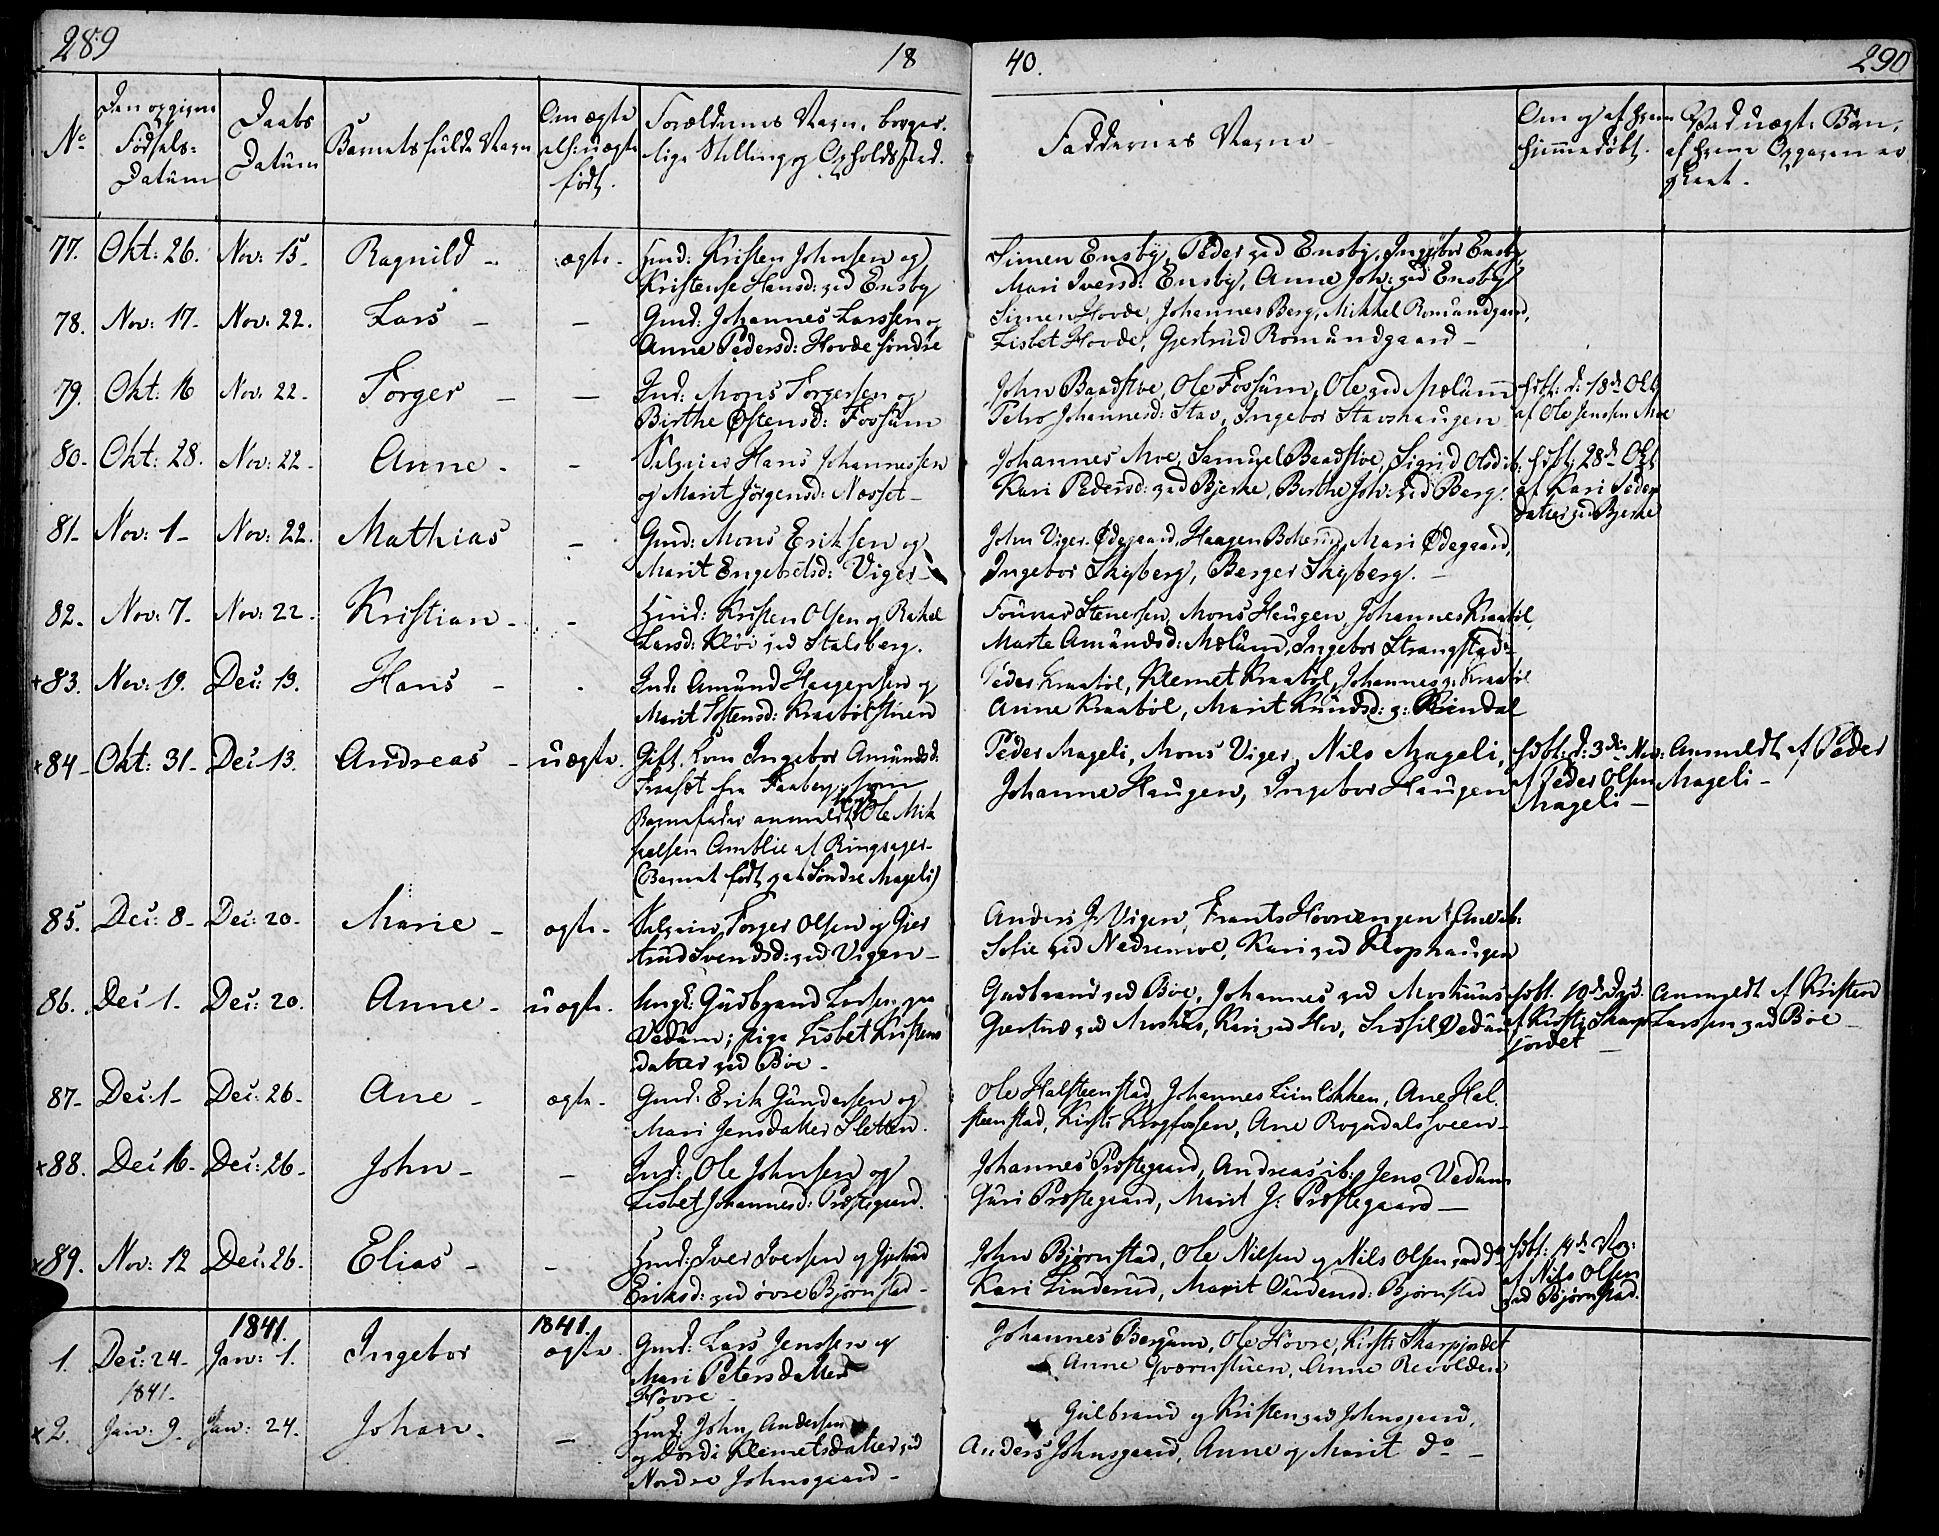 SAH, Øyer prestekontor, Ministerialbok nr. 4, 1824-1841, s. 289-290